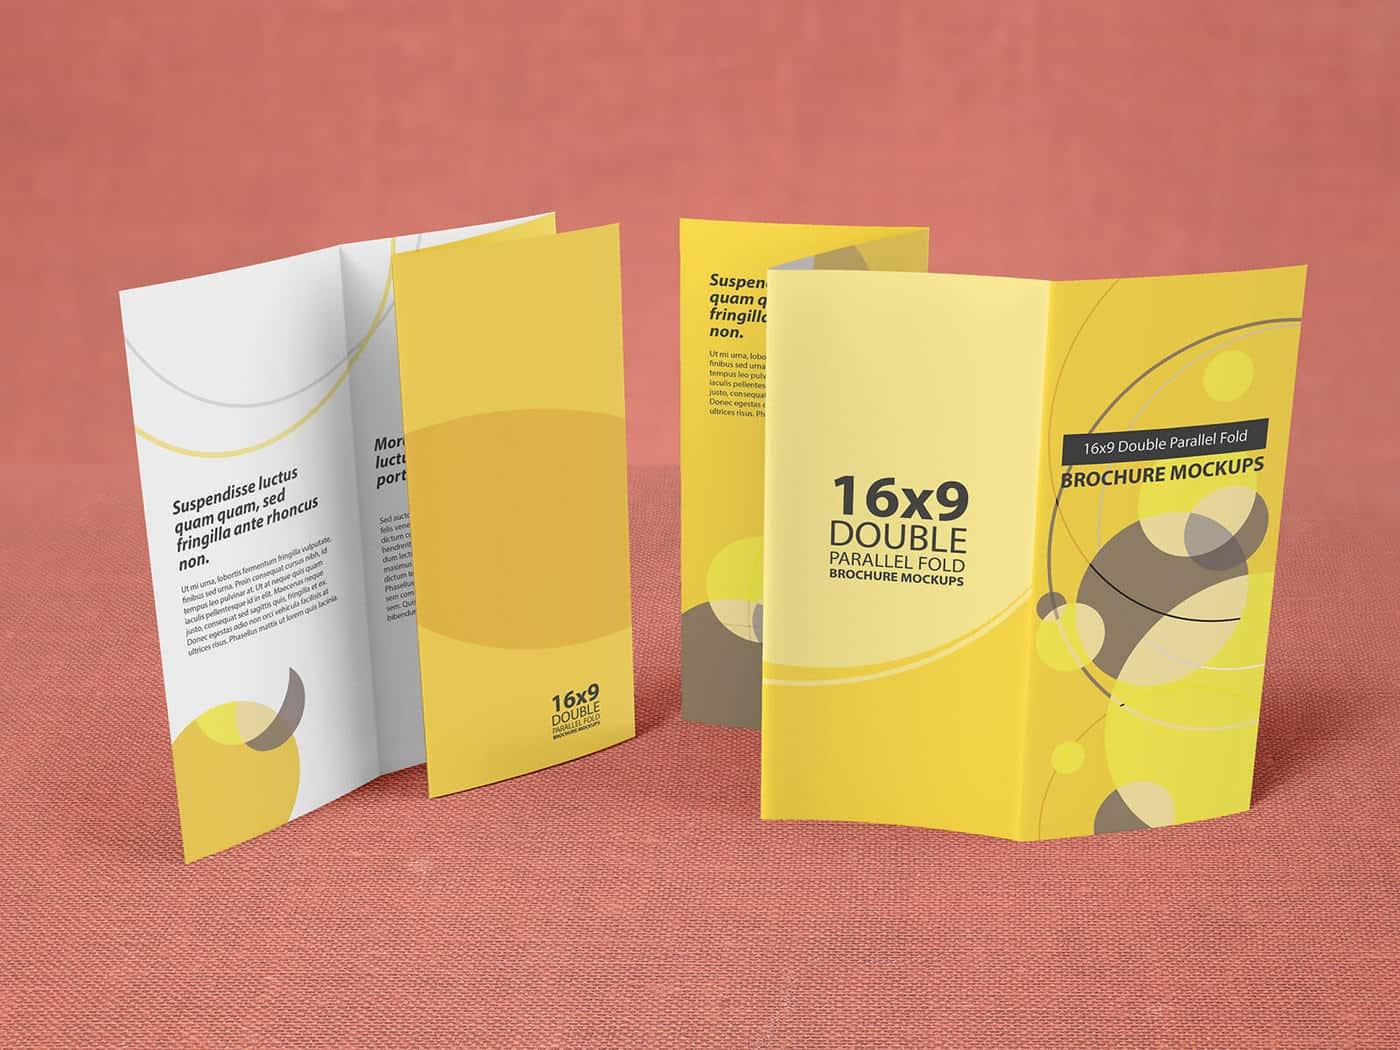 16x9 Double Parallel Fold Brochure Mockups